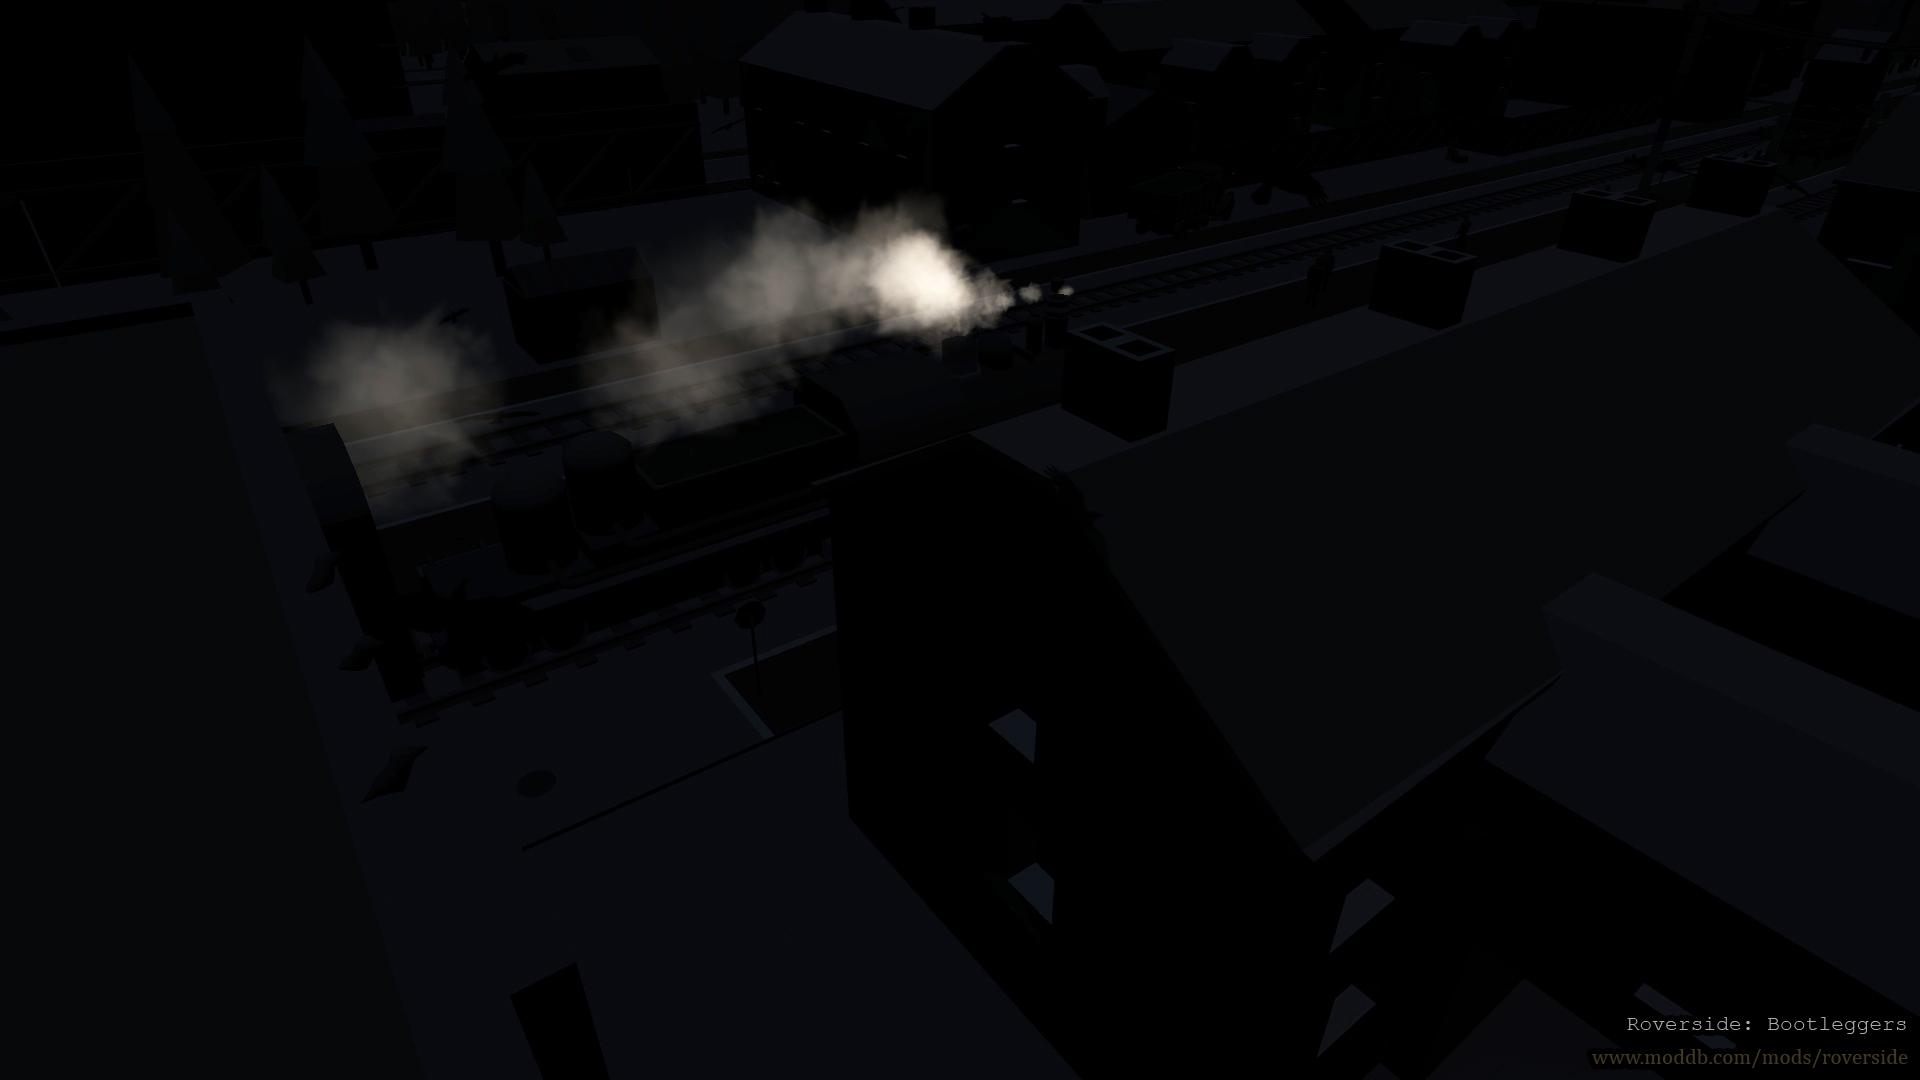 Night outside the window